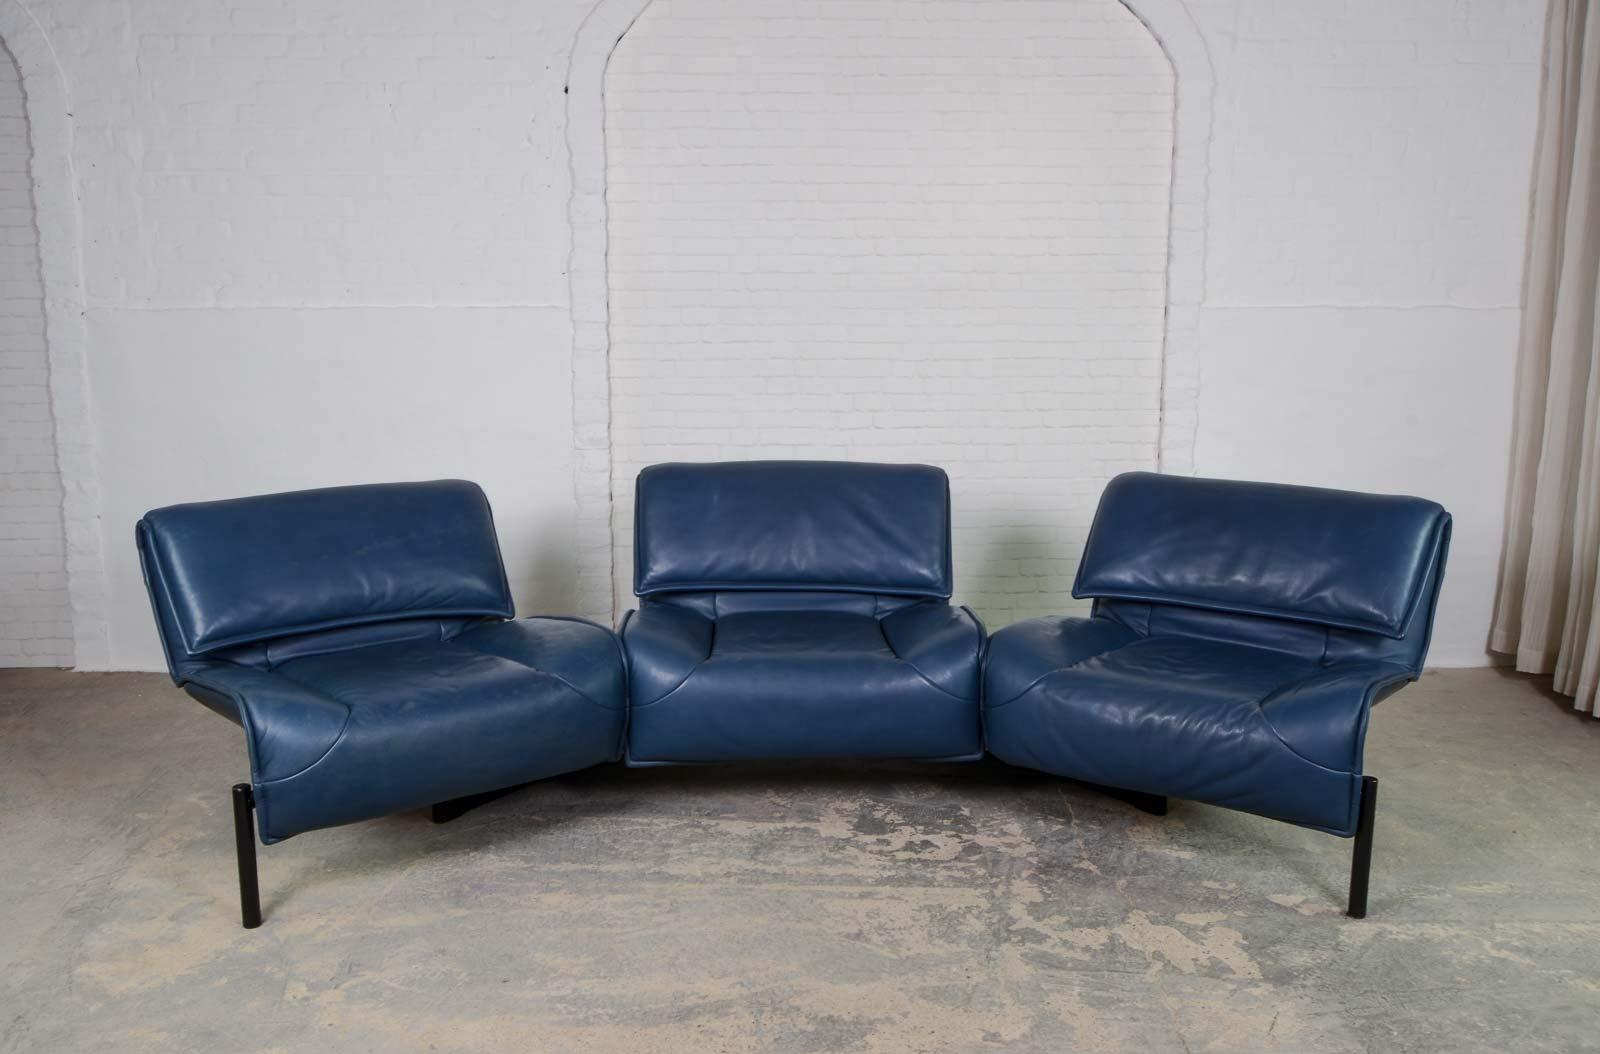 blaues mid century veranda sofa von vico magistretti f r cassina 1970er bei pamono kaufen. Black Bedroom Furniture Sets. Home Design Ideas